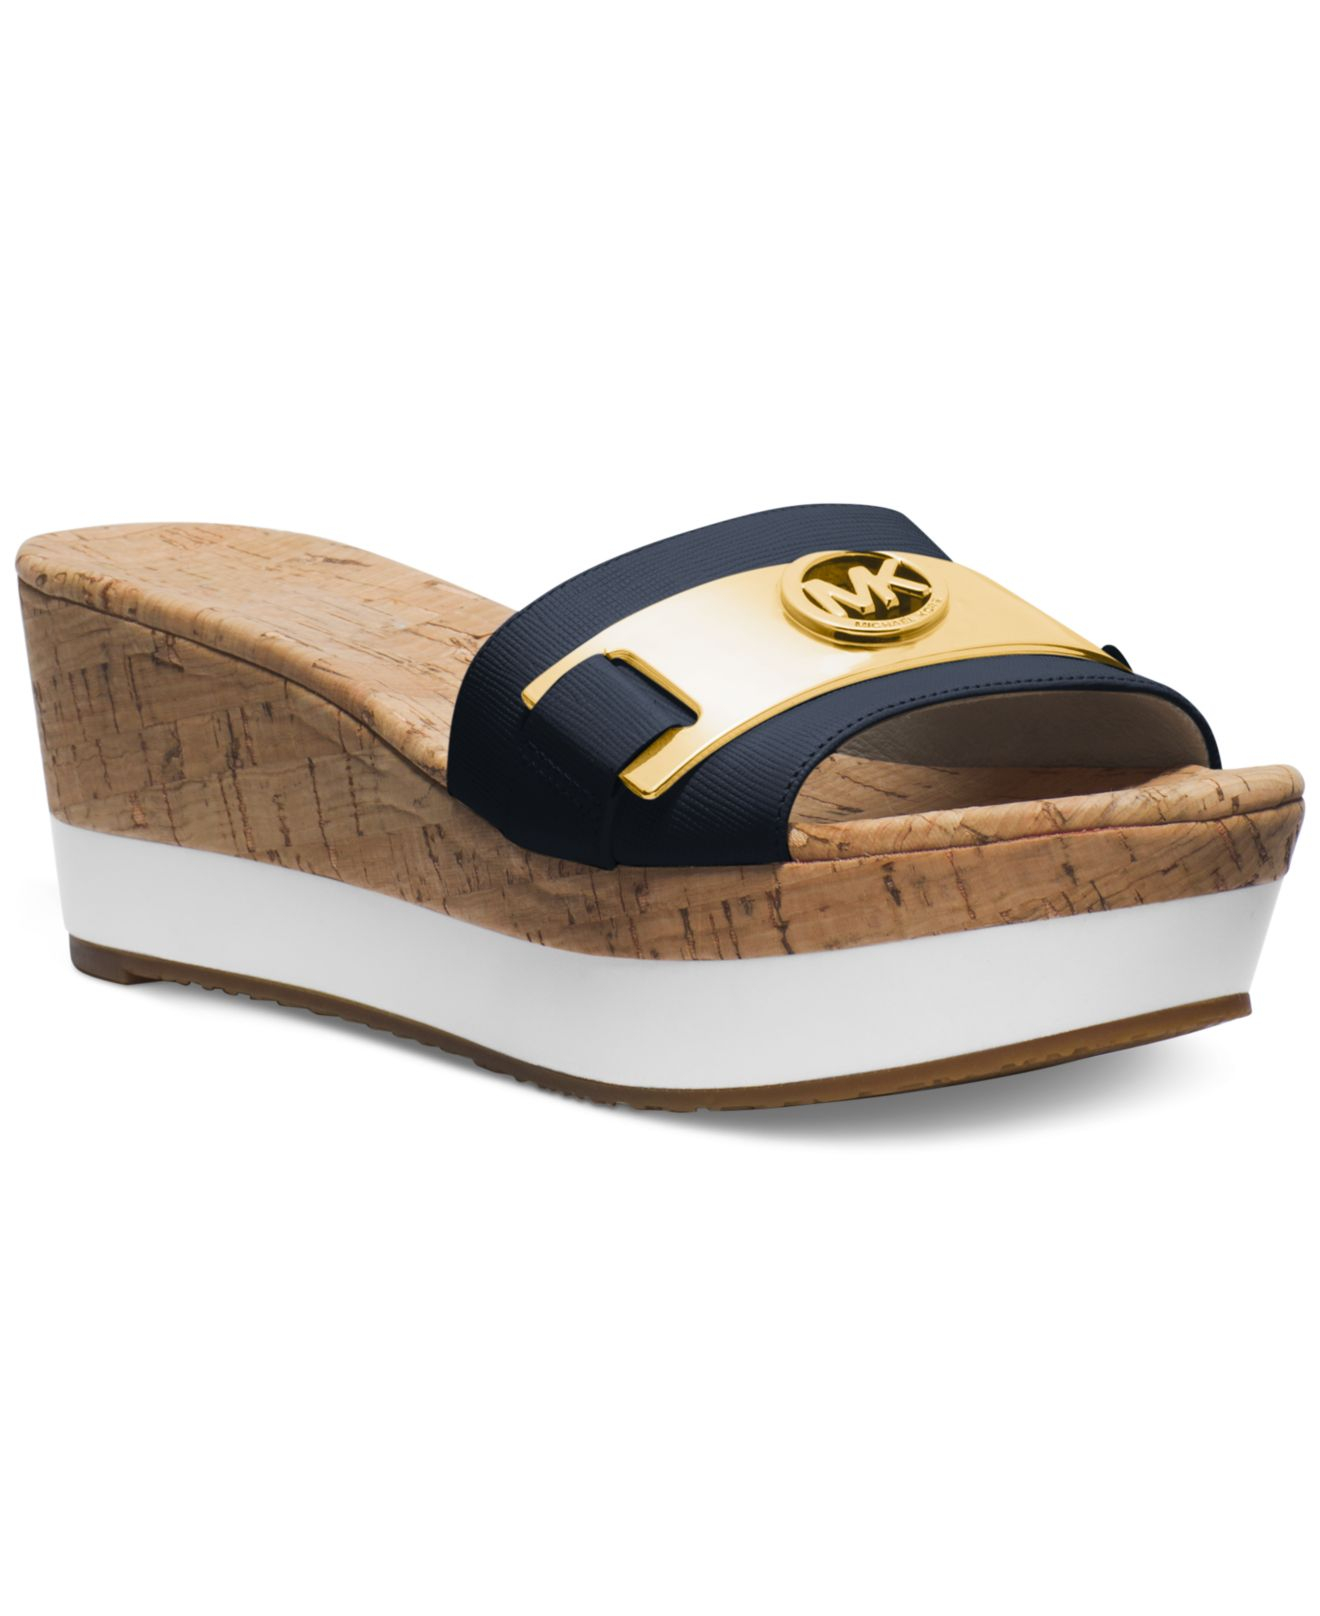 0346627f017 Lyst - Michael Kors Michael Warren Platform Wedge Sandals in Blue